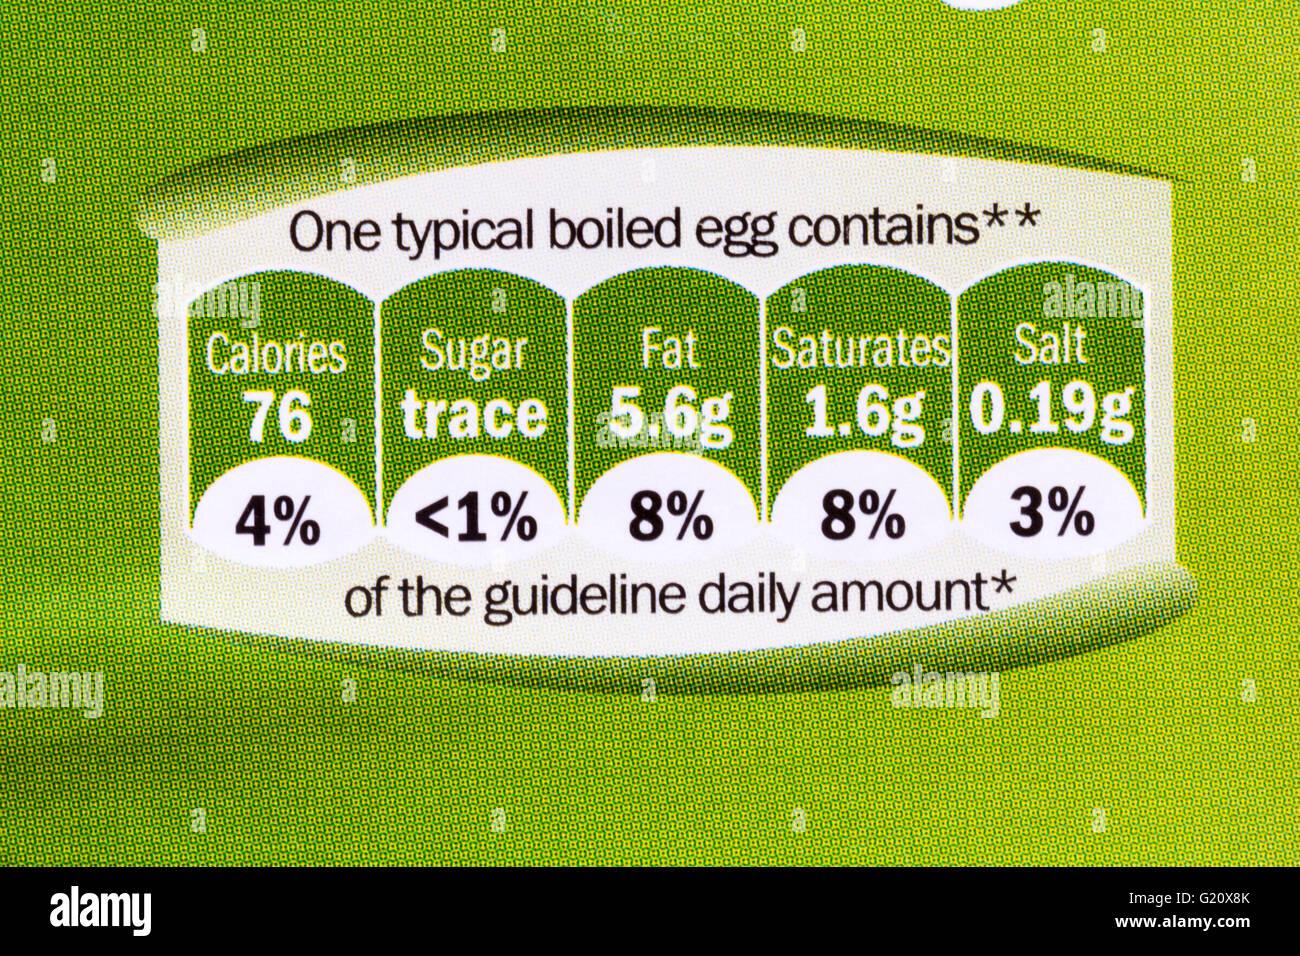 gda information, guideline daily amount, on carton of 6 British medium free range eggs Stock Photo